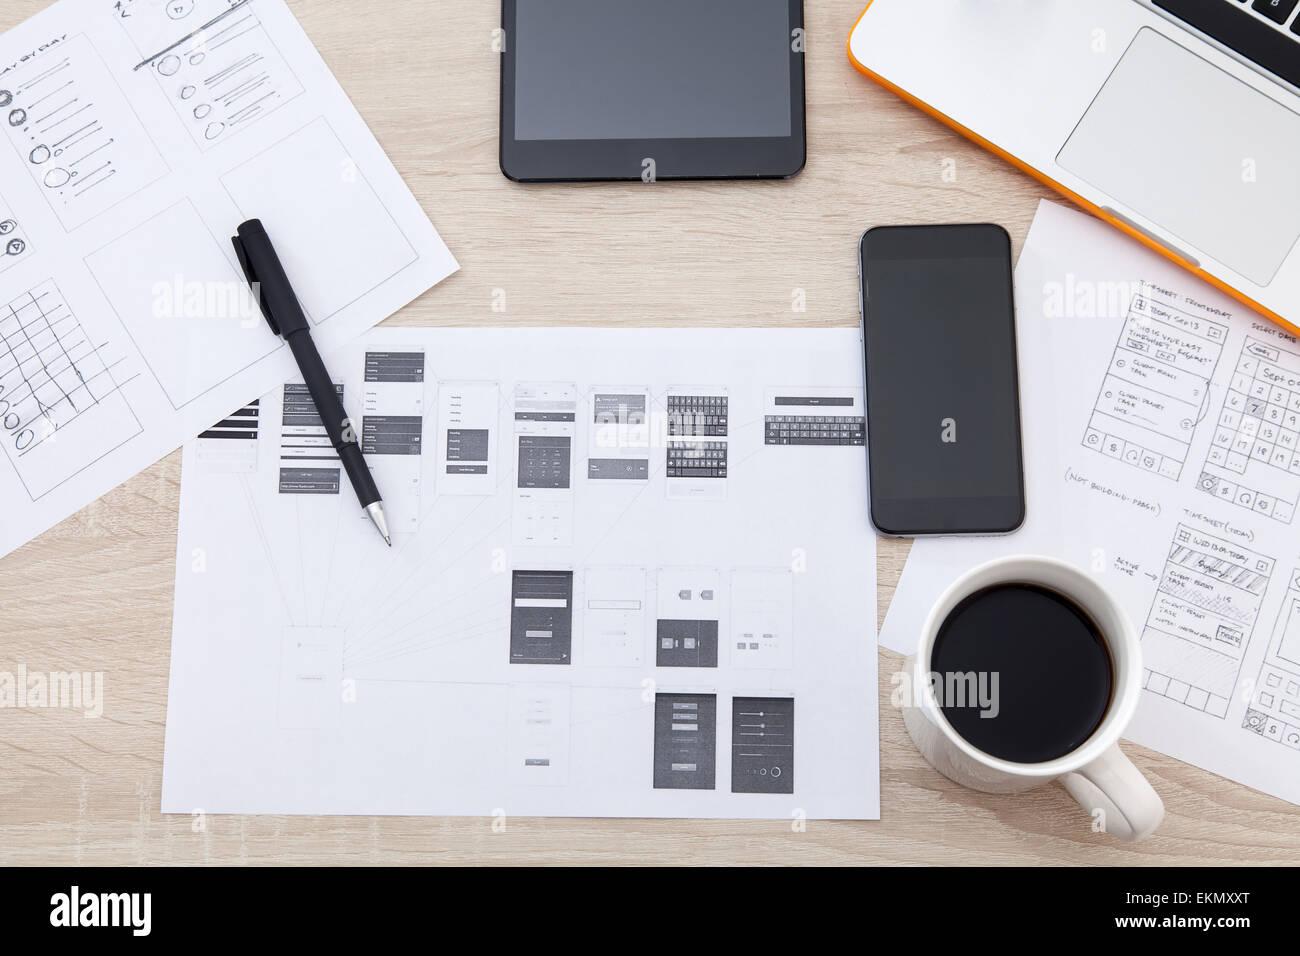 Workplace Developer Mobile Applications Laptop Stockfotos ...